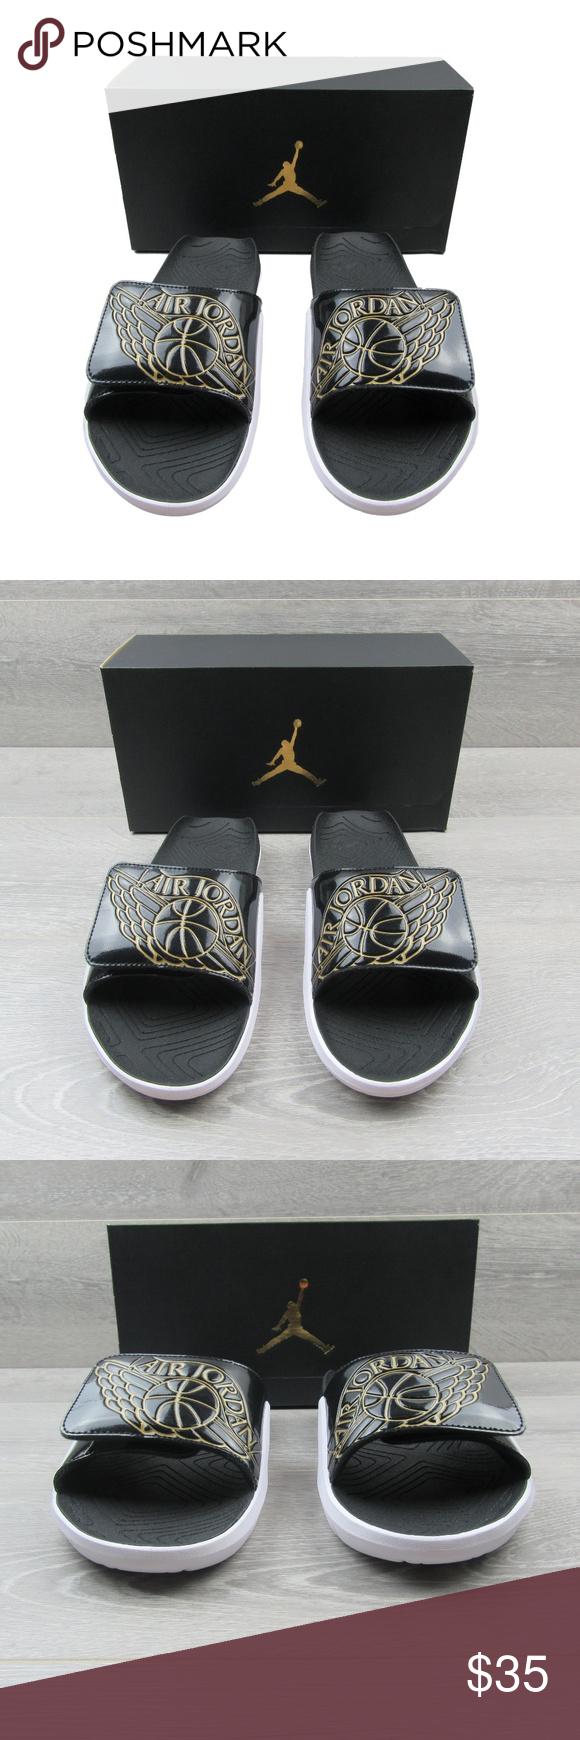 15670529add448 Air Jordan Hydro 7 Slides Sandals Air Jordan Hydro 7 Slides Sandals Black  Gold White Men s